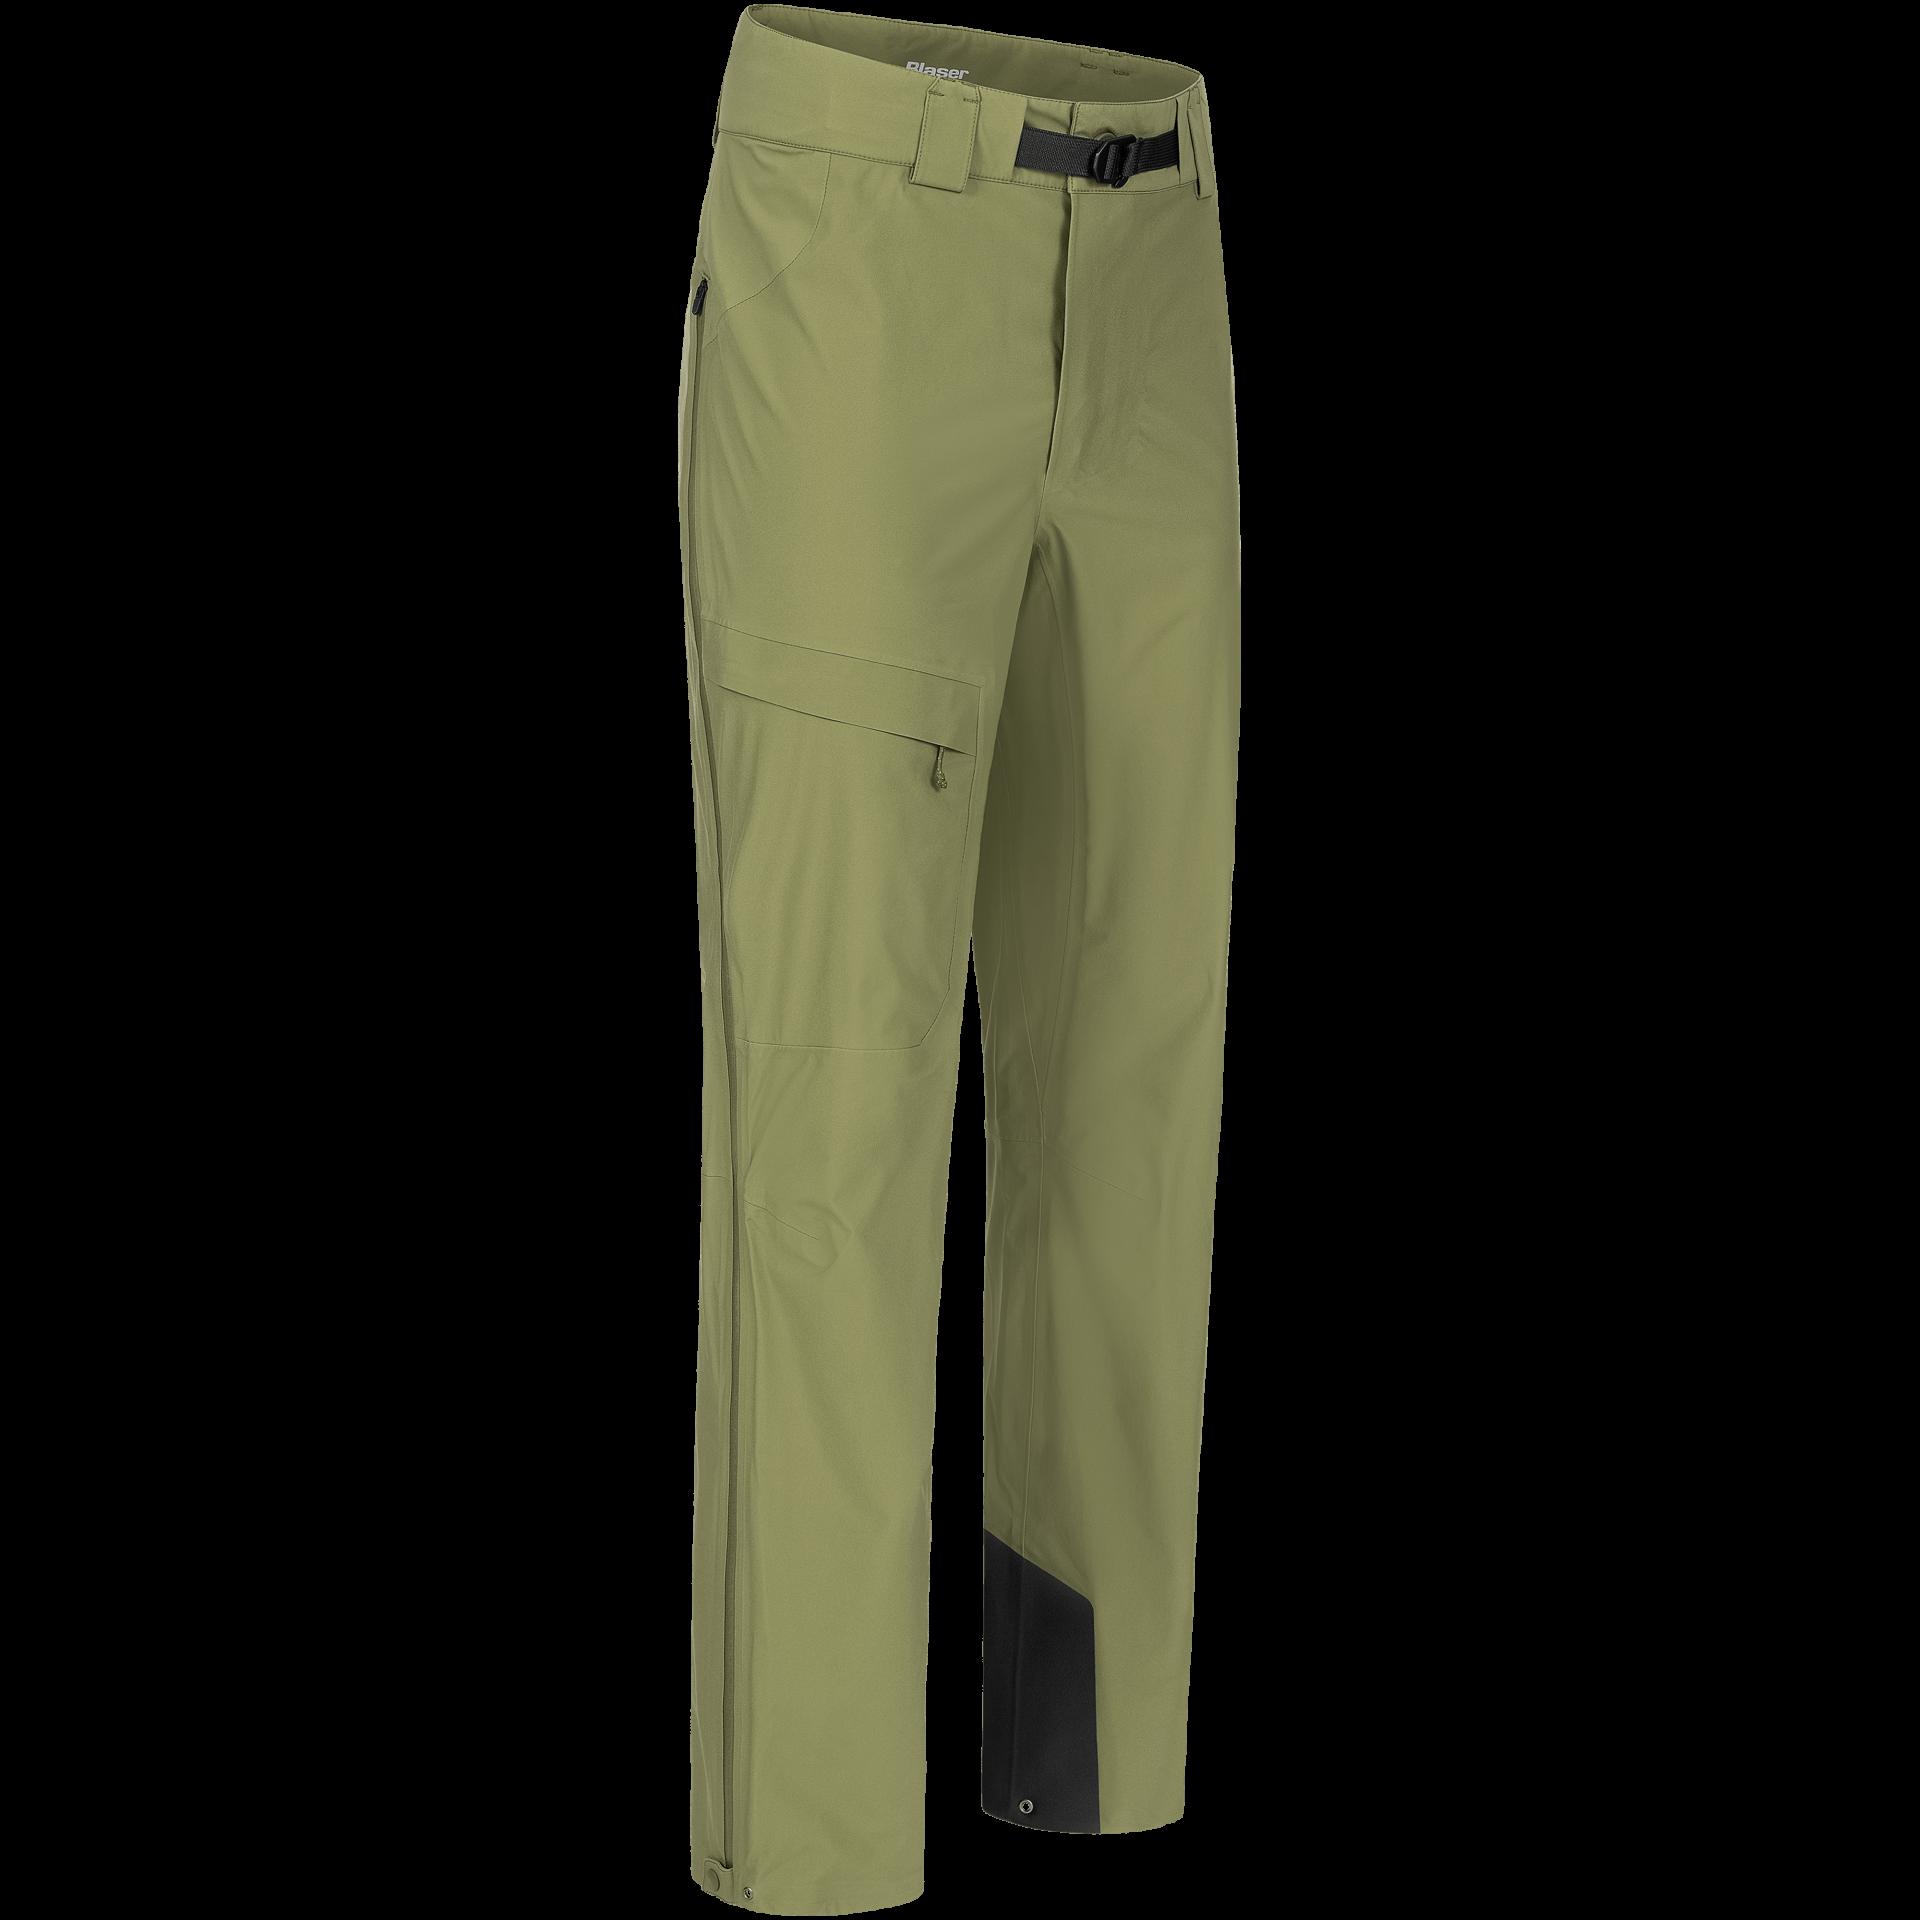 Venture 3L Trousers